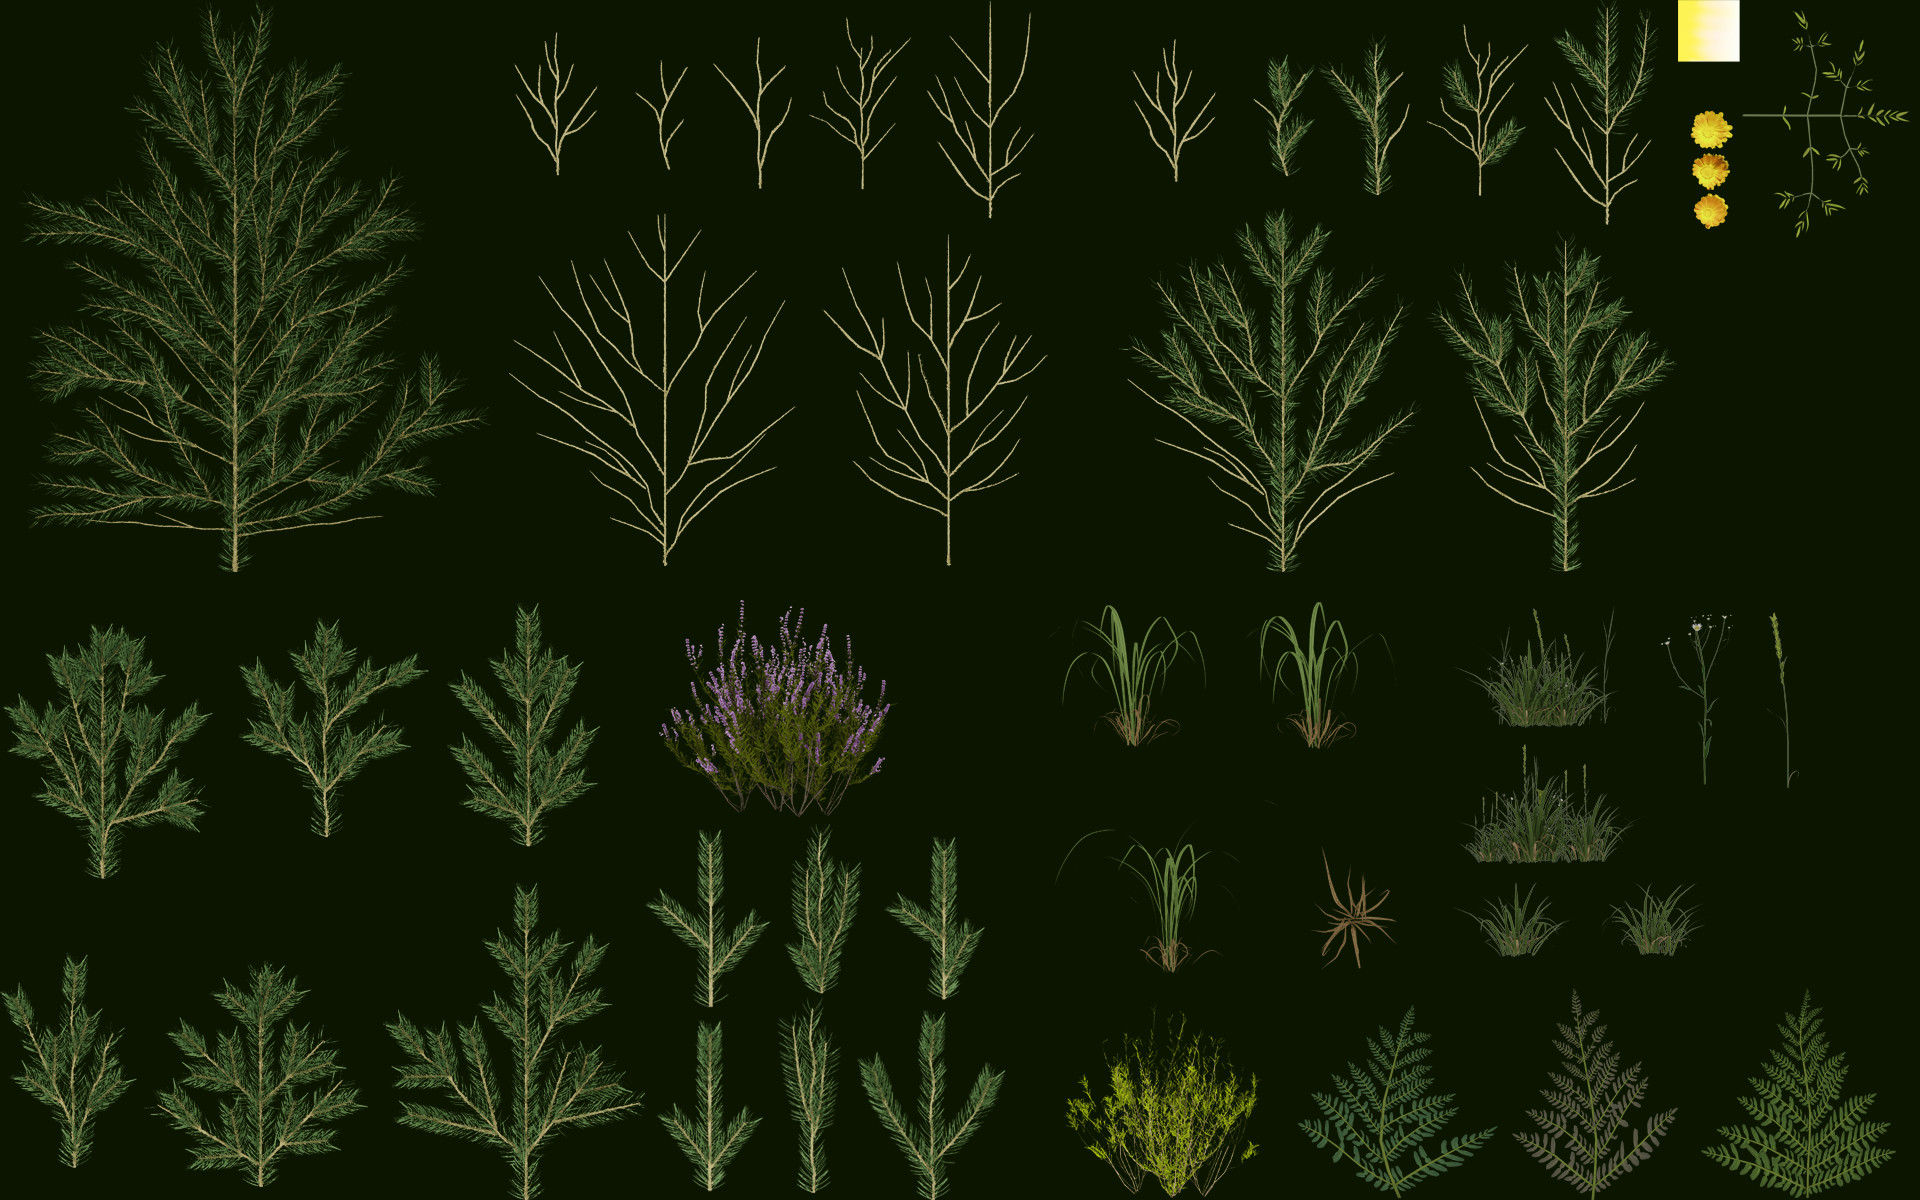 ArtStation - Forest Environment, Maciej Stok-Stokowiec